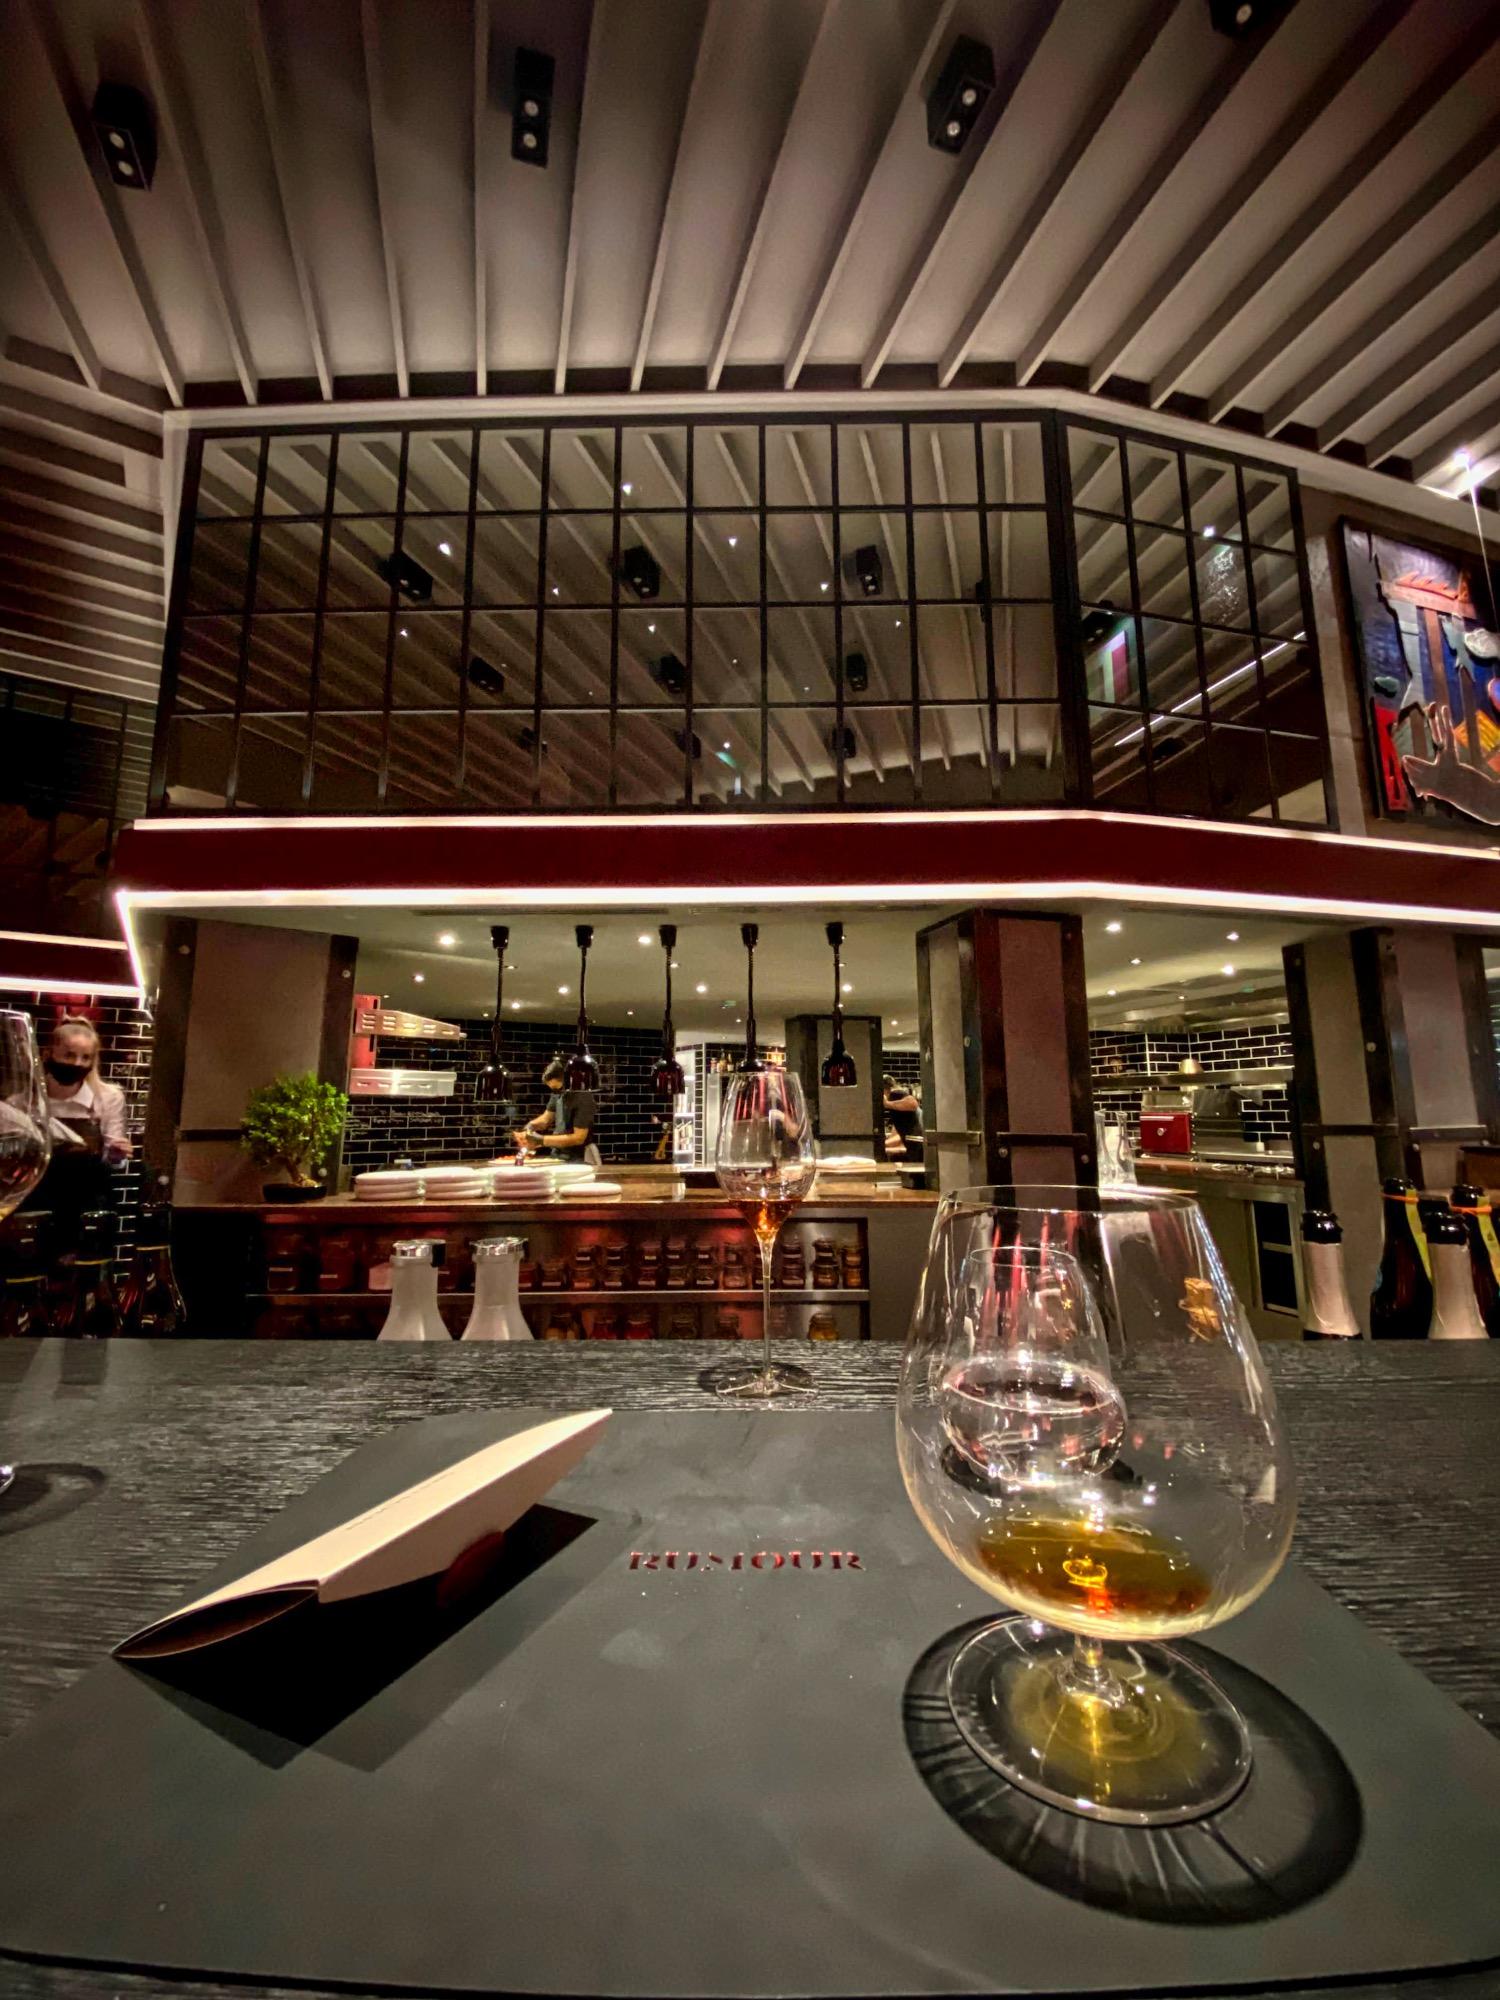 img_8687_rumour_racz_jeno_budapest_restaurant_jokuti_vilagevo_l_f.jpeg